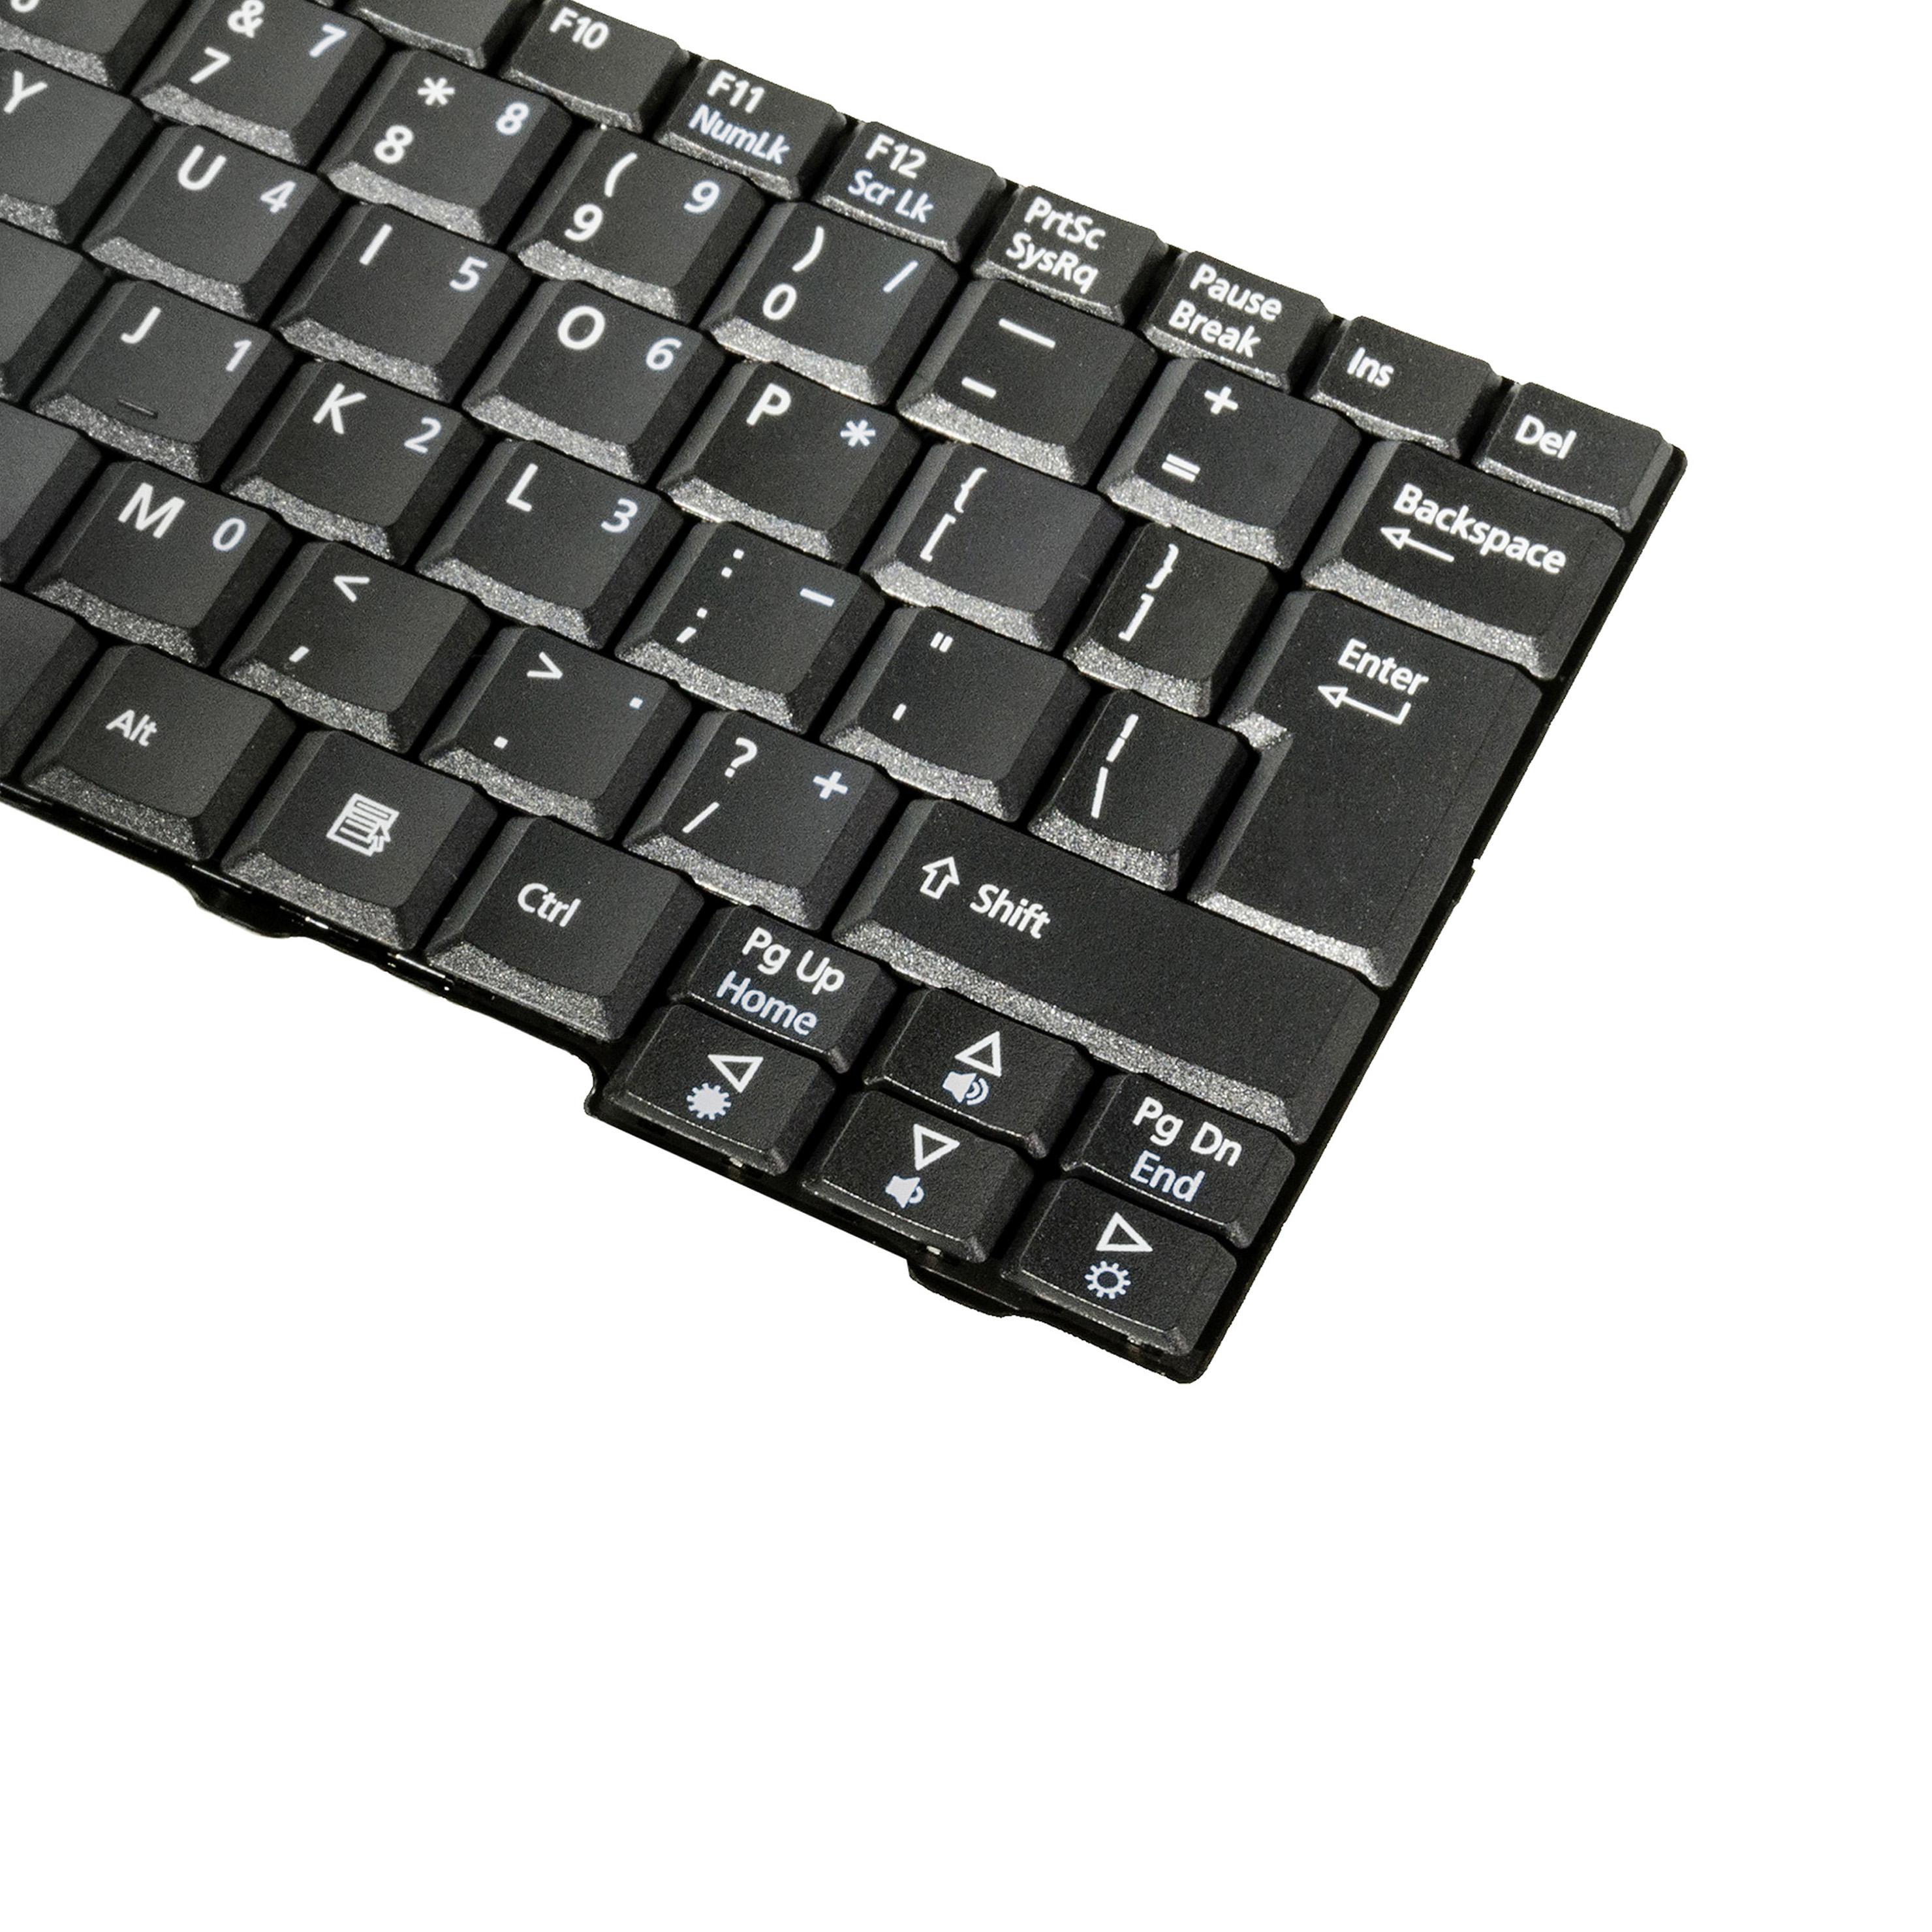 Clavier-pour-Ordinateur-Acer-Aspire-One-A110-BP-A110-BW-QWERTY-UK-English